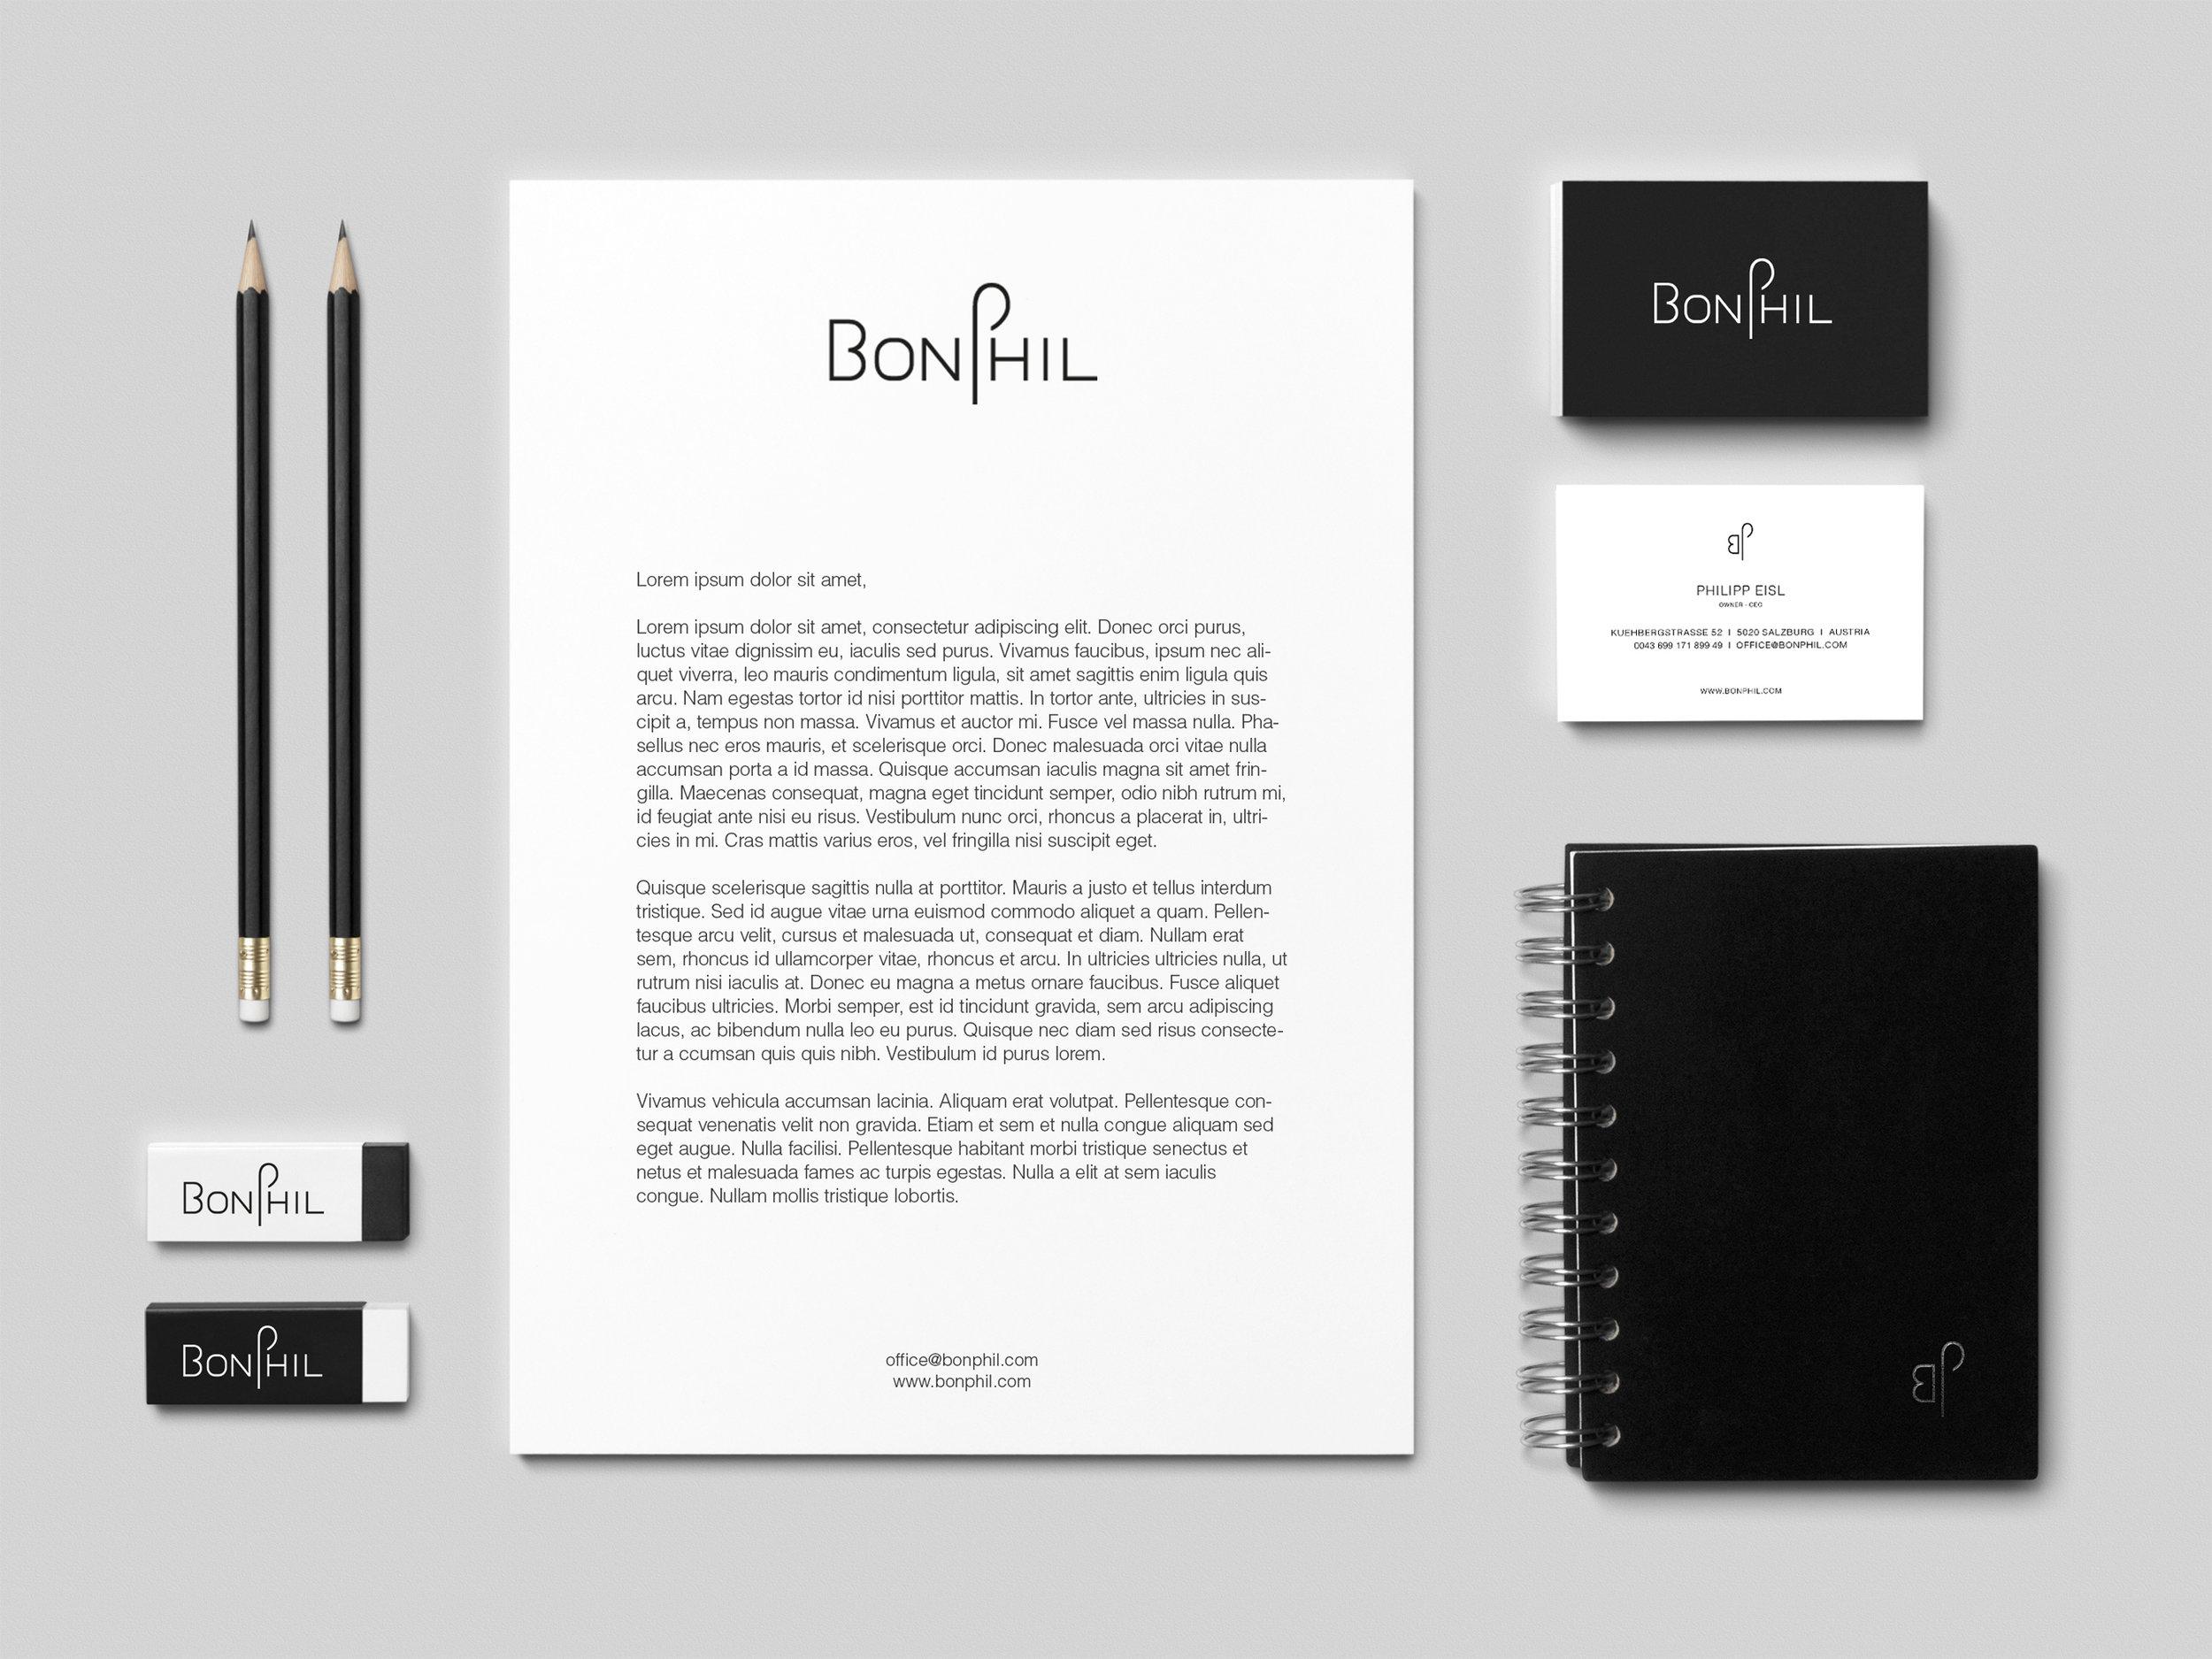 MAMOWORKS. BonPhil. Corporate Design Web Design Fashion Photogrphy. Maximilian Moosleitner. Salzburg. Austria